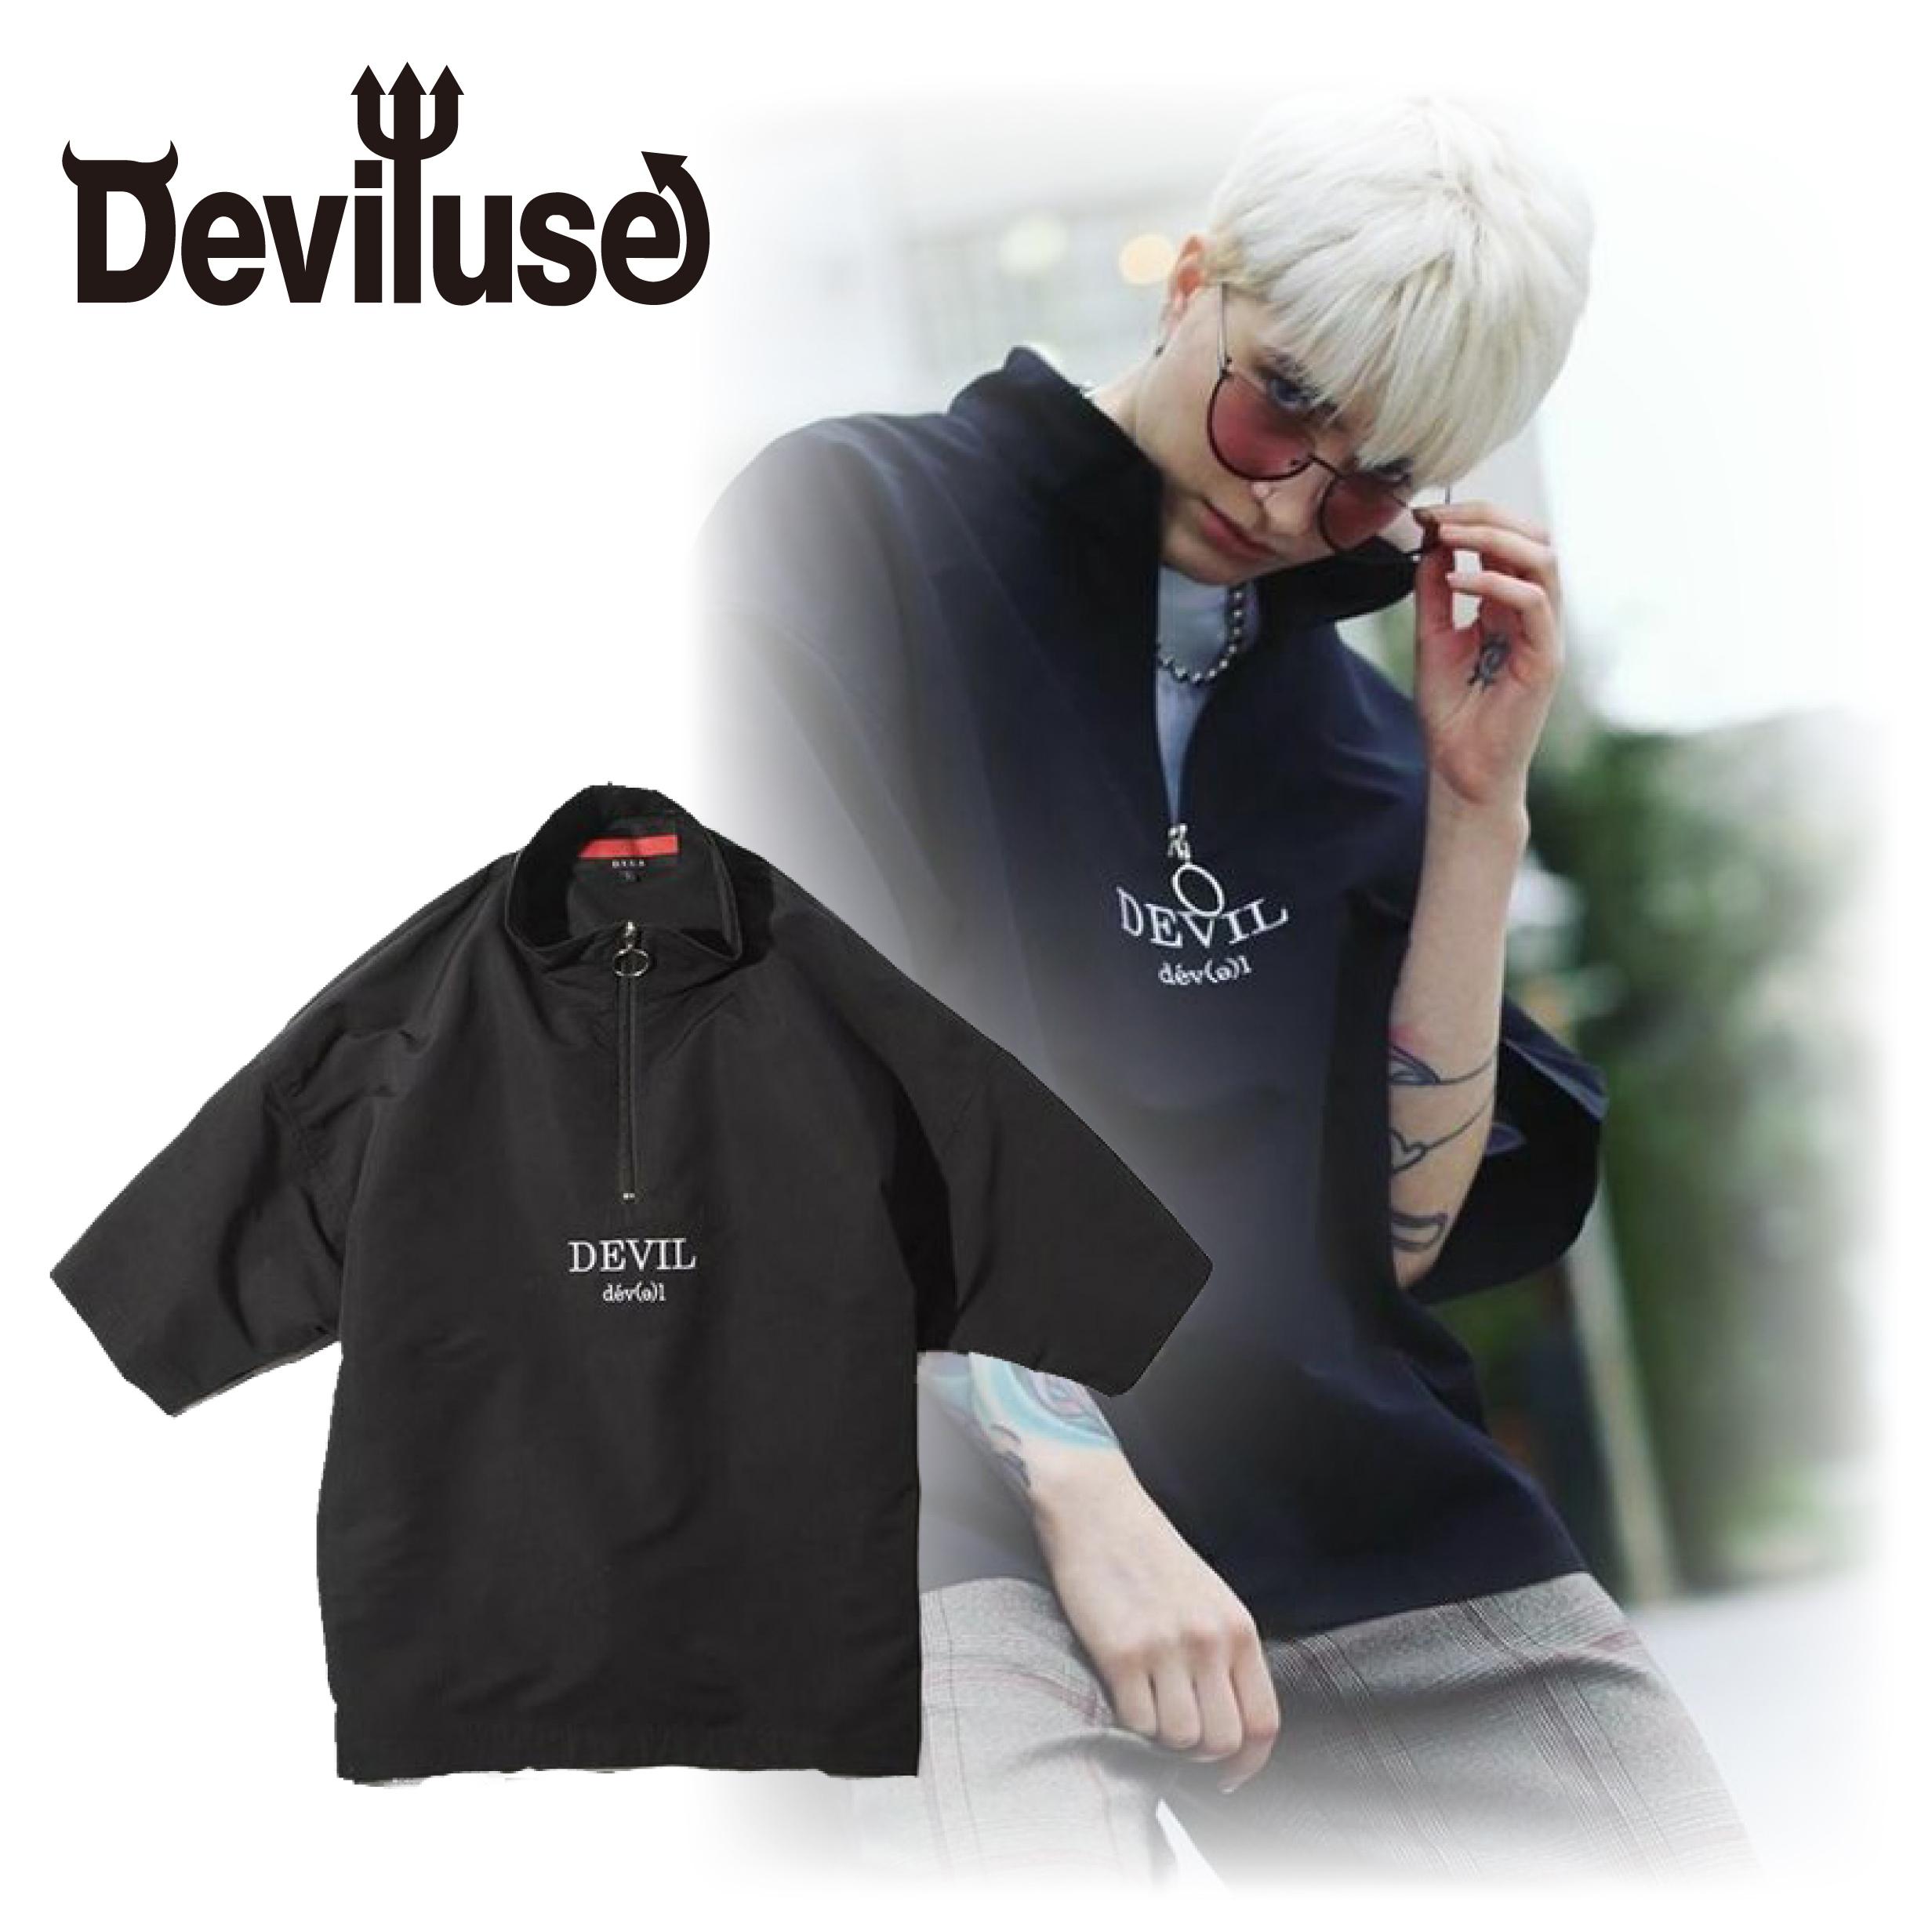 Deviluse(デビルユース) | Harf Zip Shirts (Black)